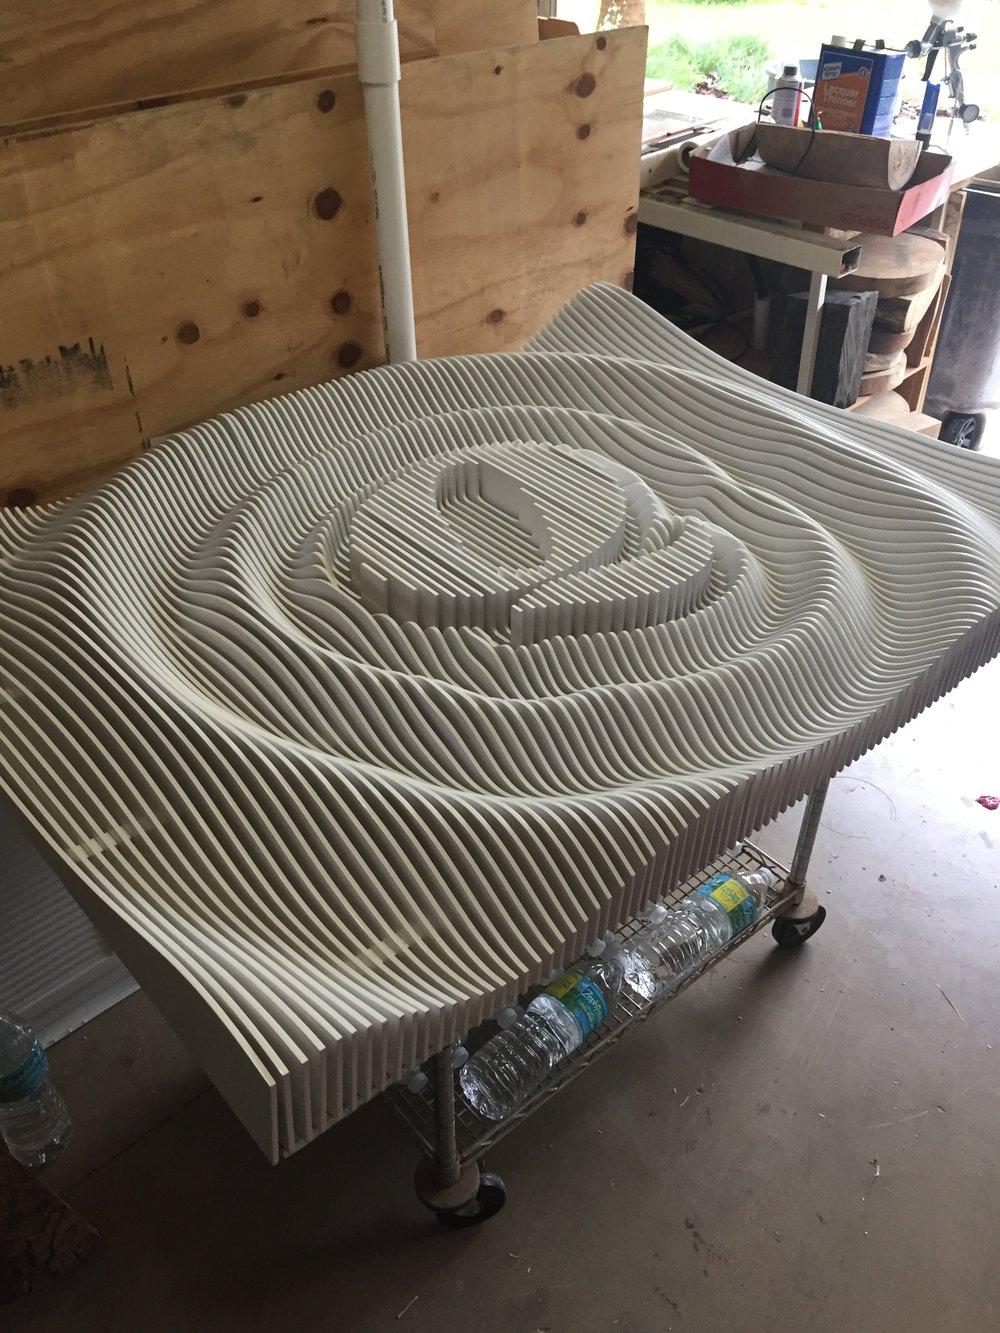 graphic ripple rippling wall panel 2 wooden parametric fixture modern geometric organic abstract terraform teraform laser cut cnc router.JPG